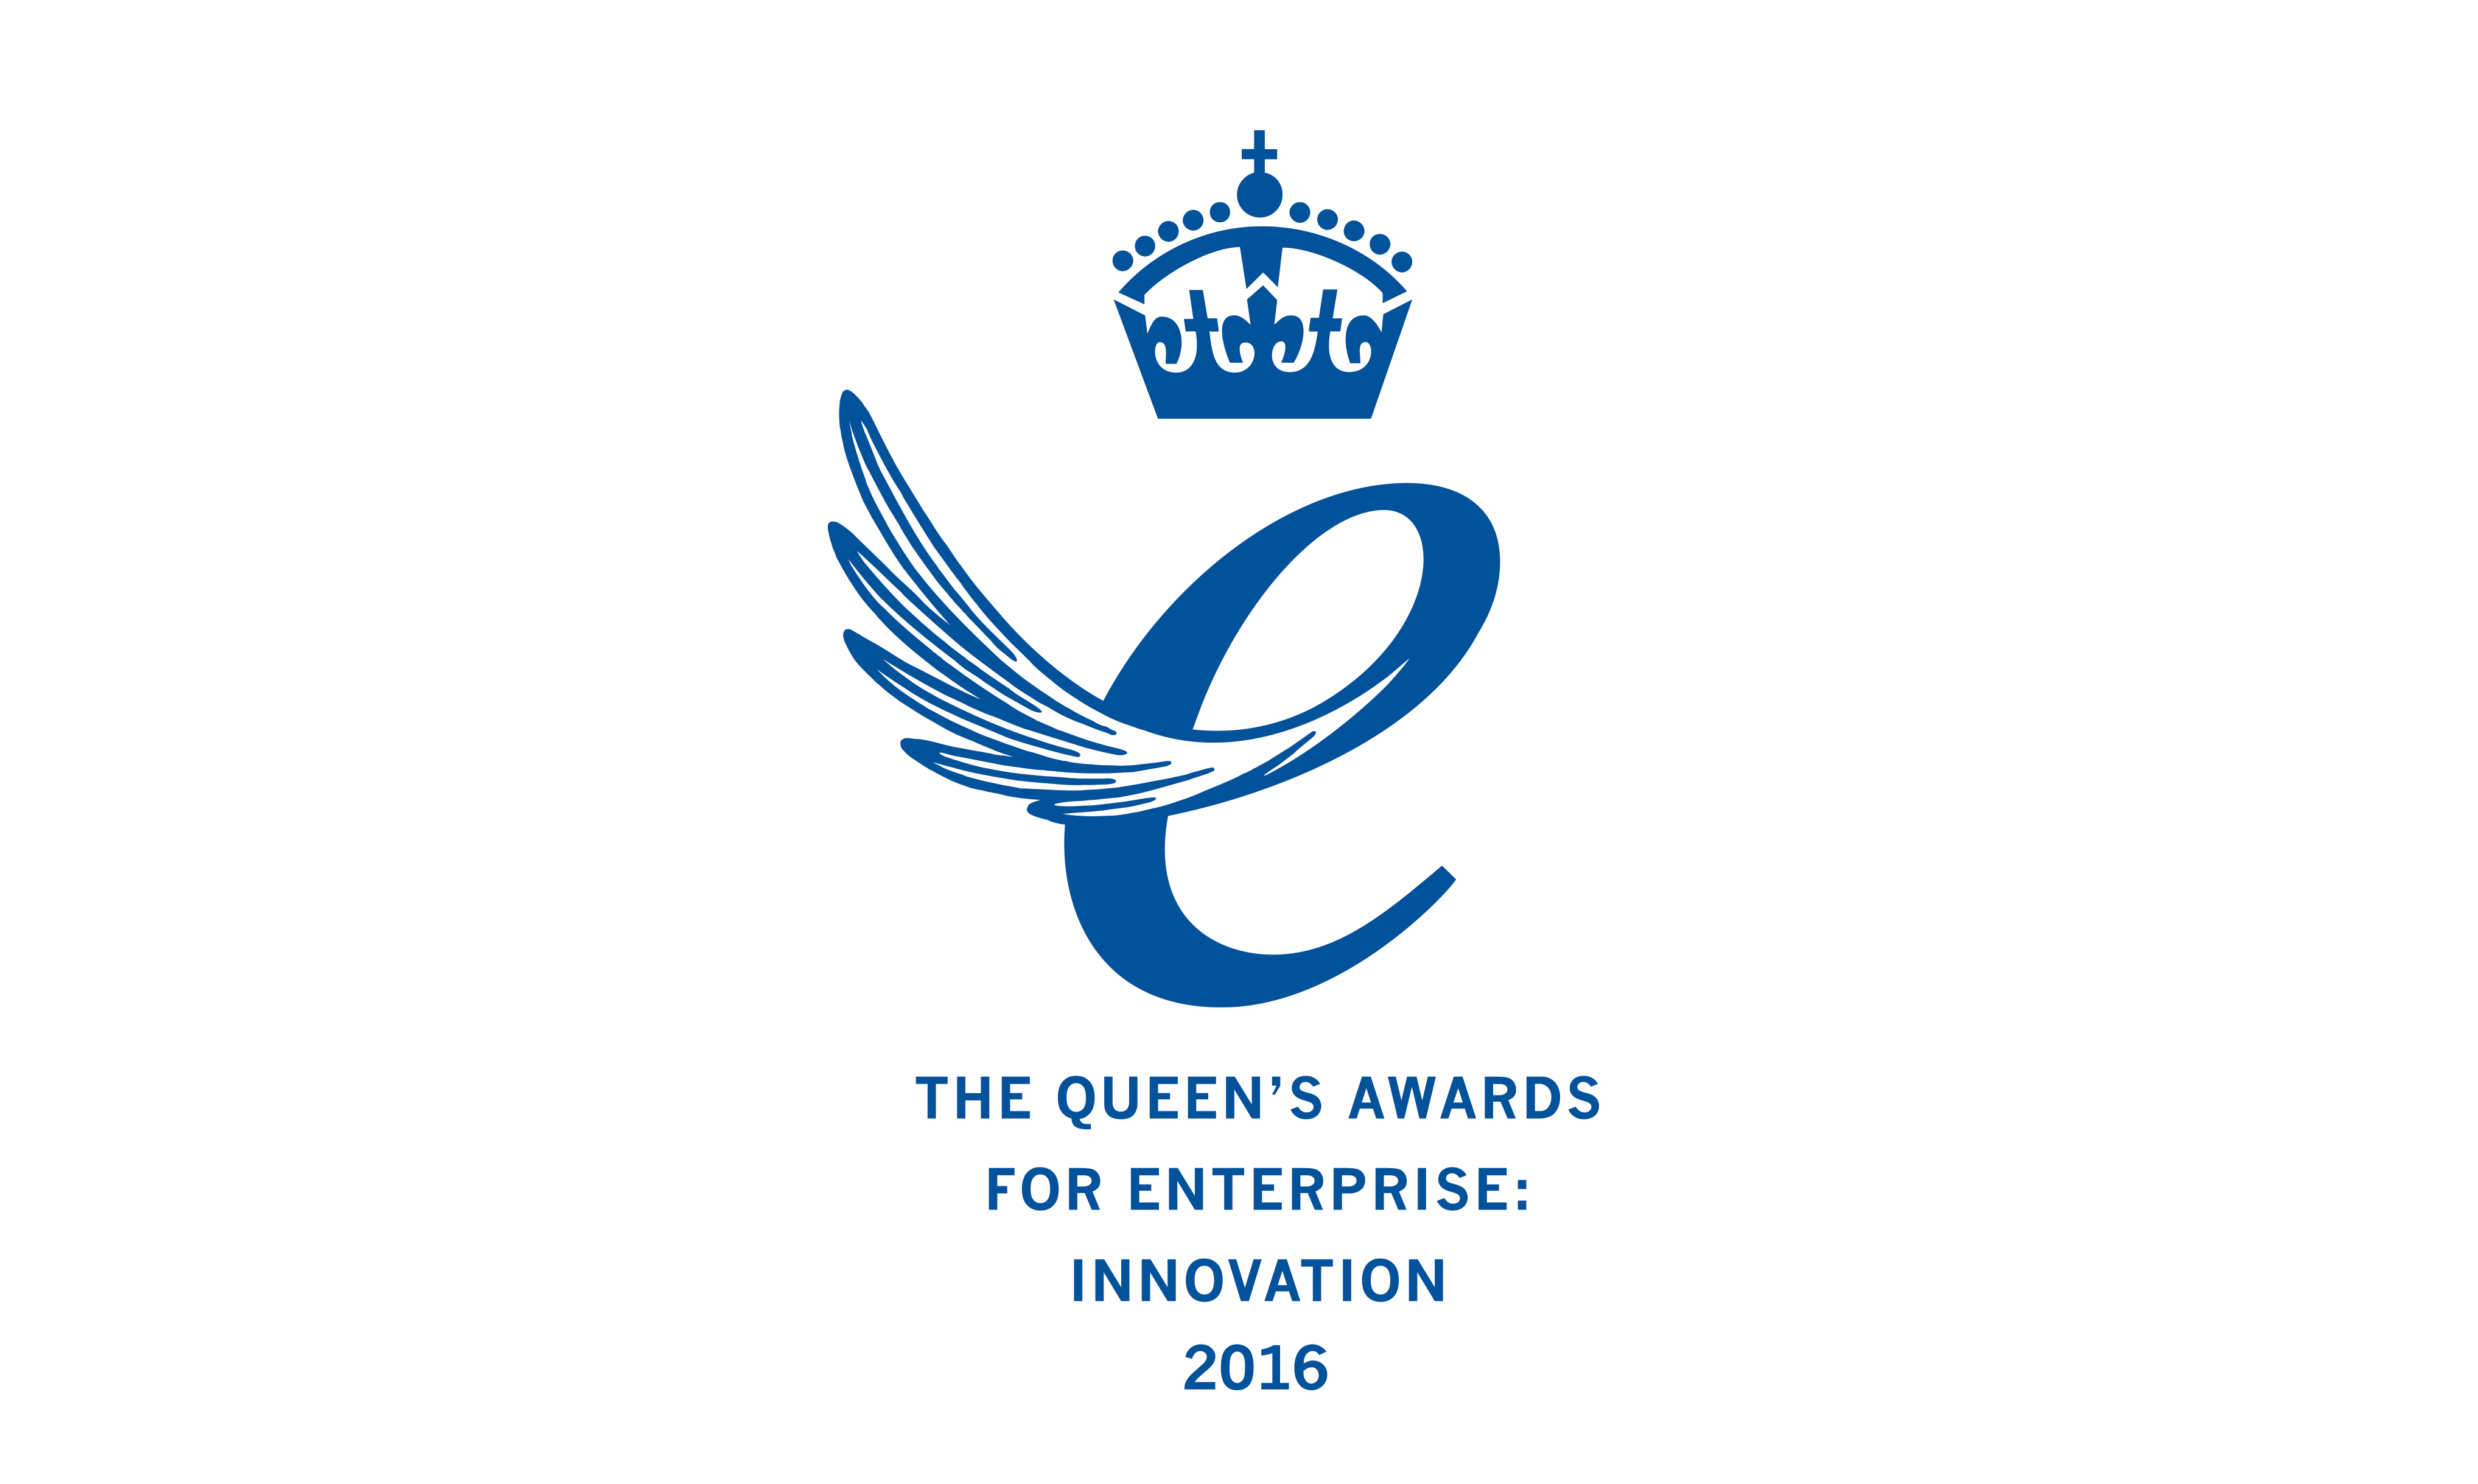 queen's award for enterprise innovation 2016 emblem